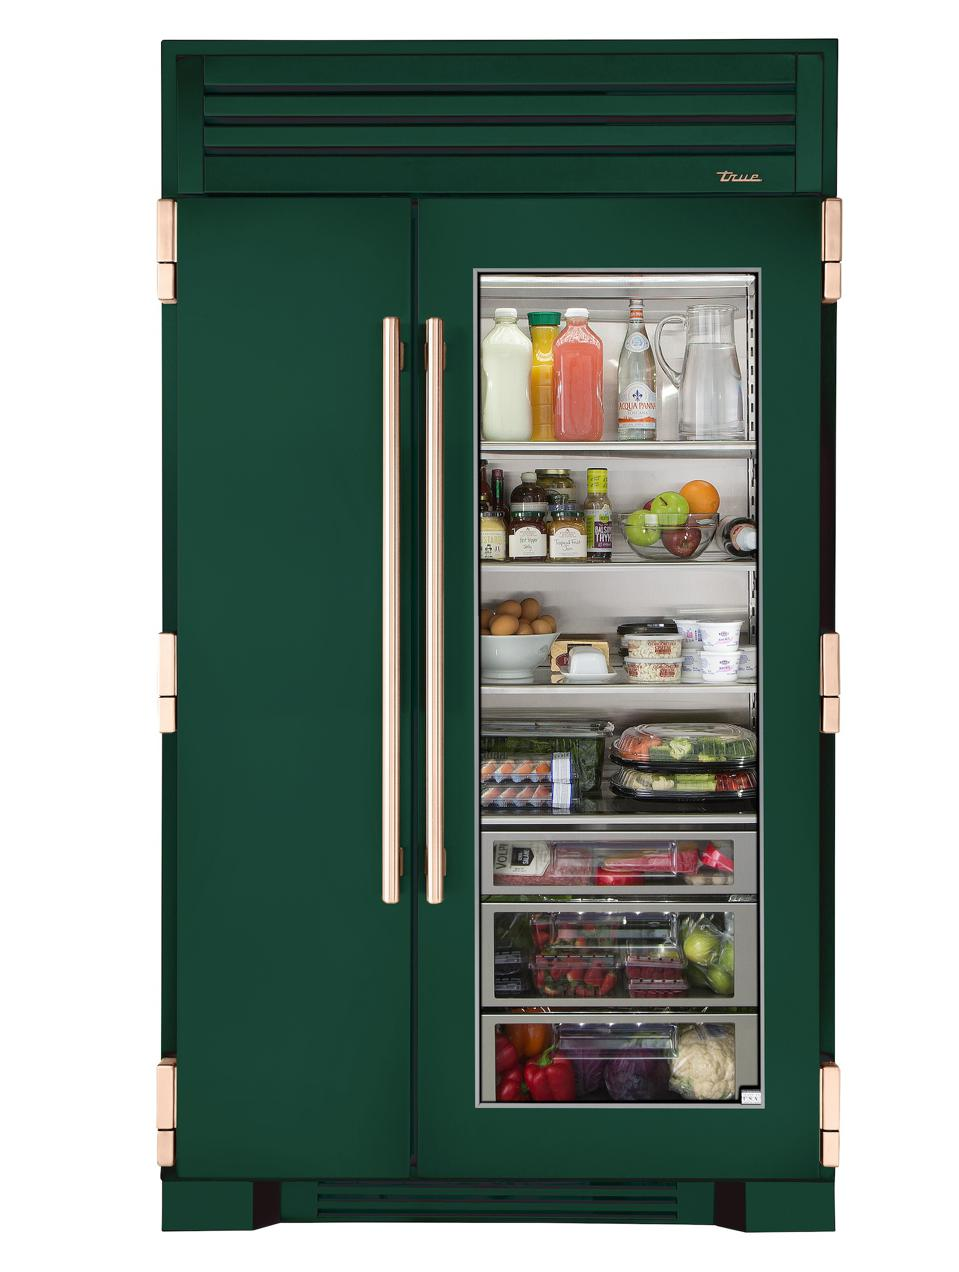 True Residential's unit in Emerald refrigerator/freezer.